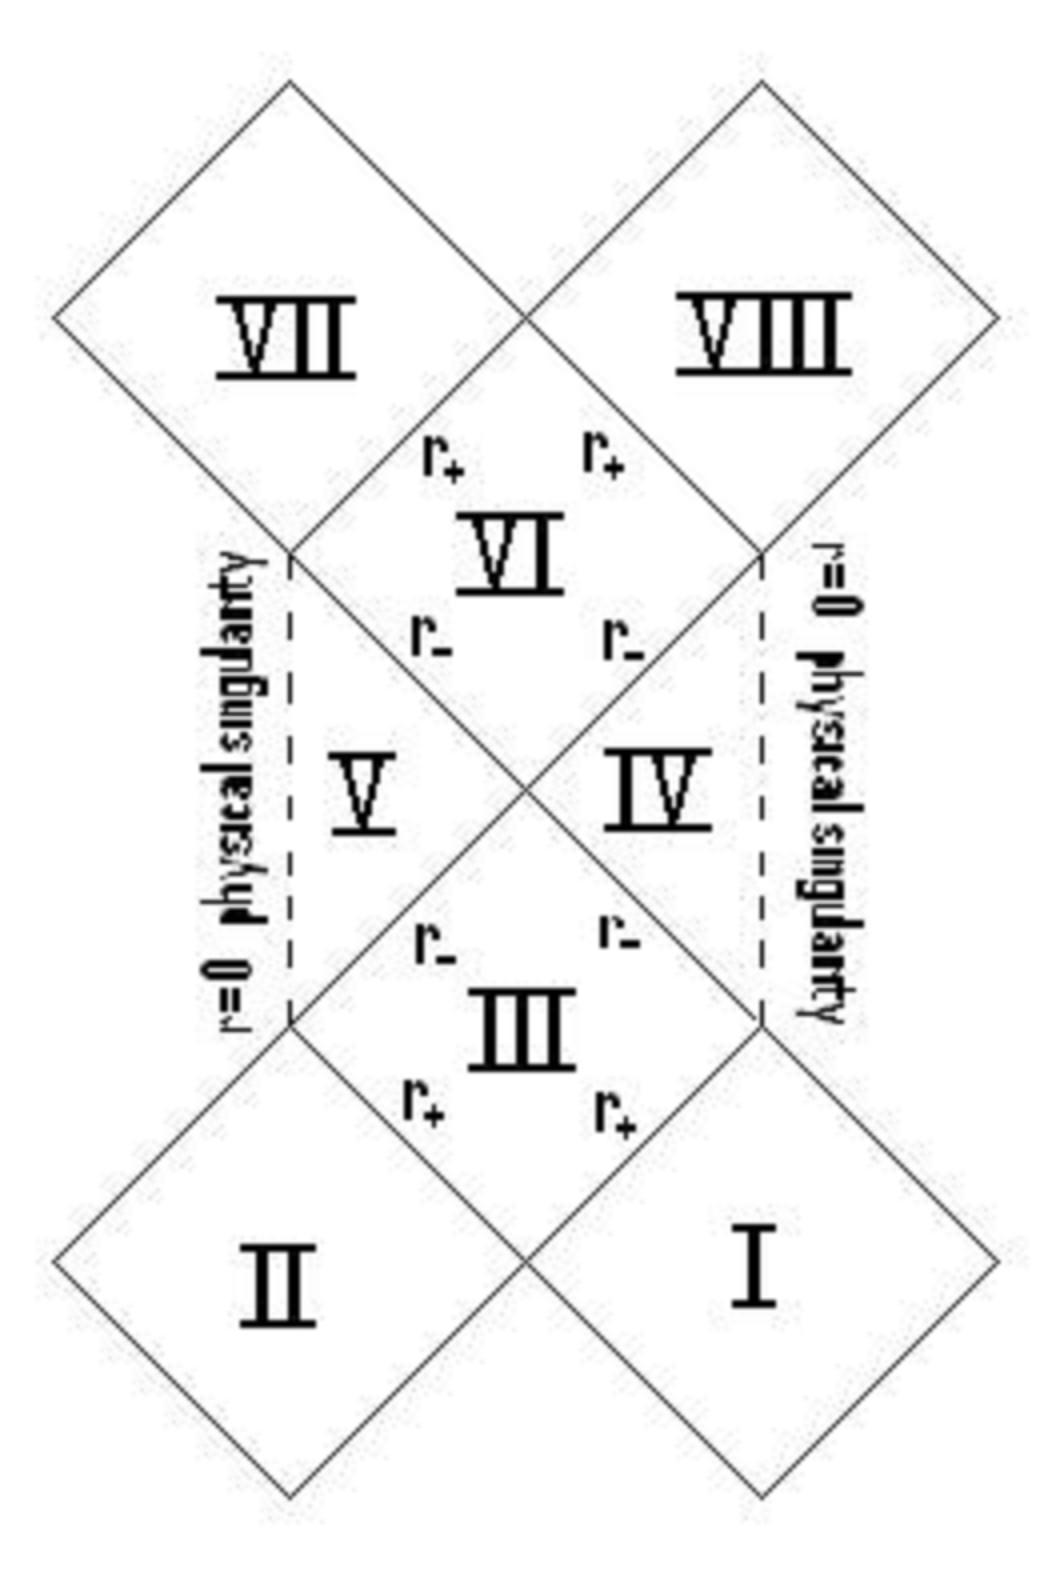 Reissner nordstrm wikiversity pooptronica